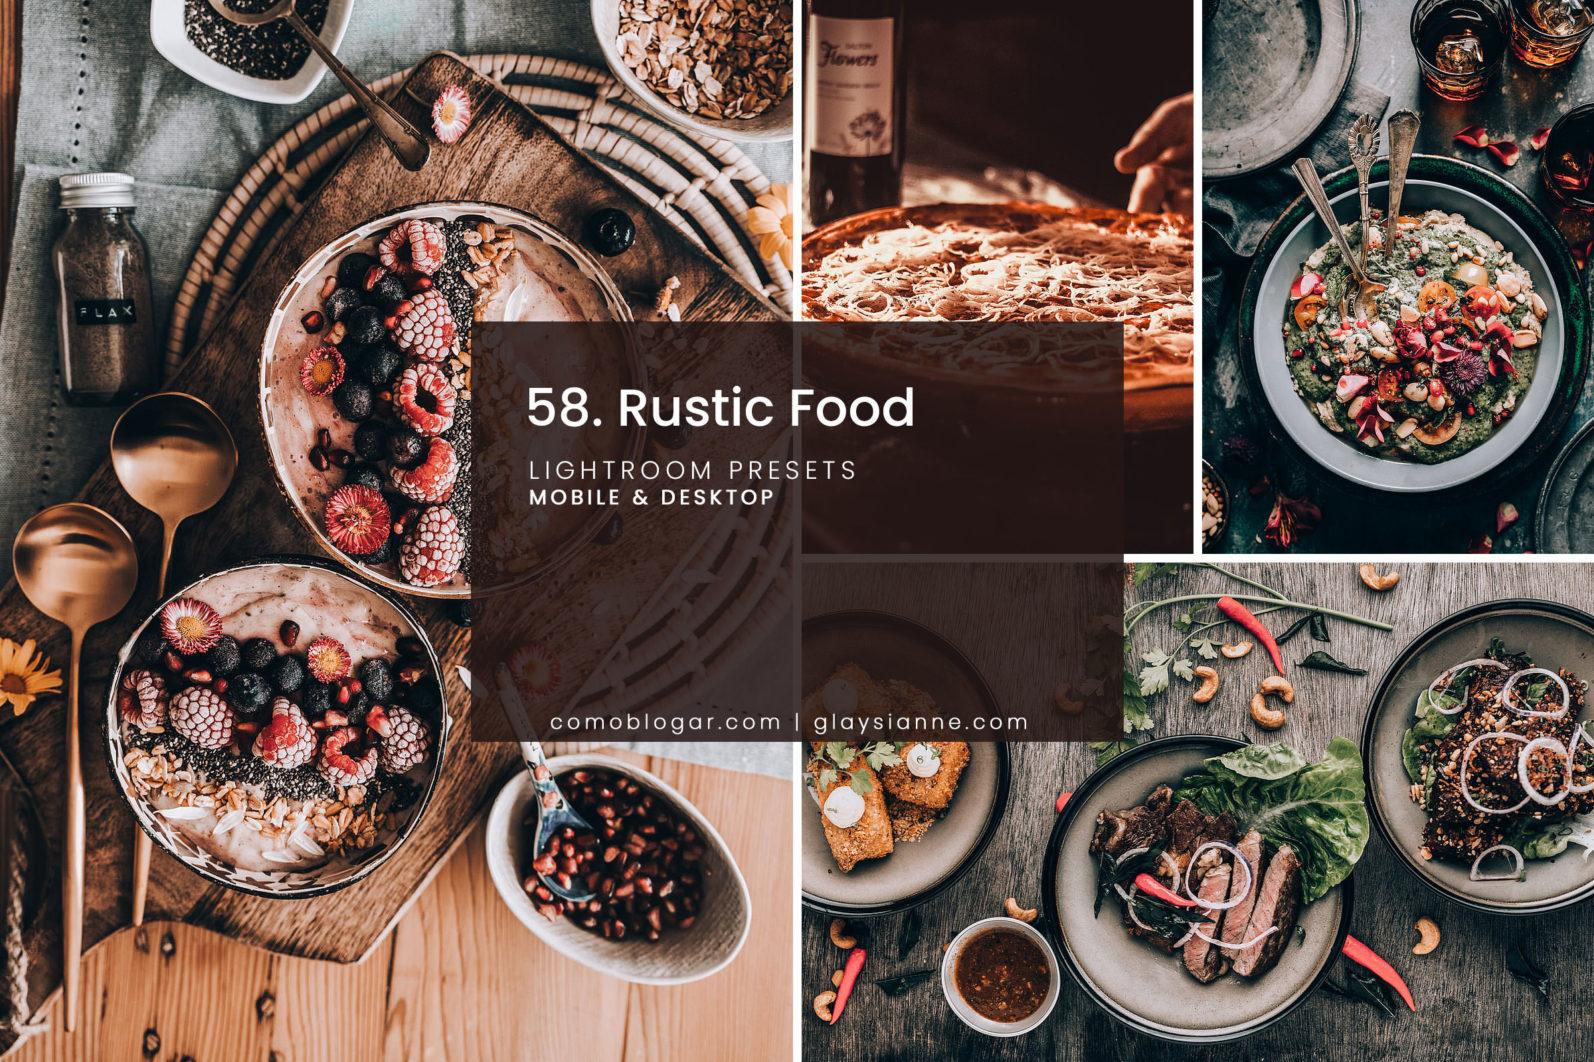 58. Rustic Food - 58.RUSTIC FOOD 01 -